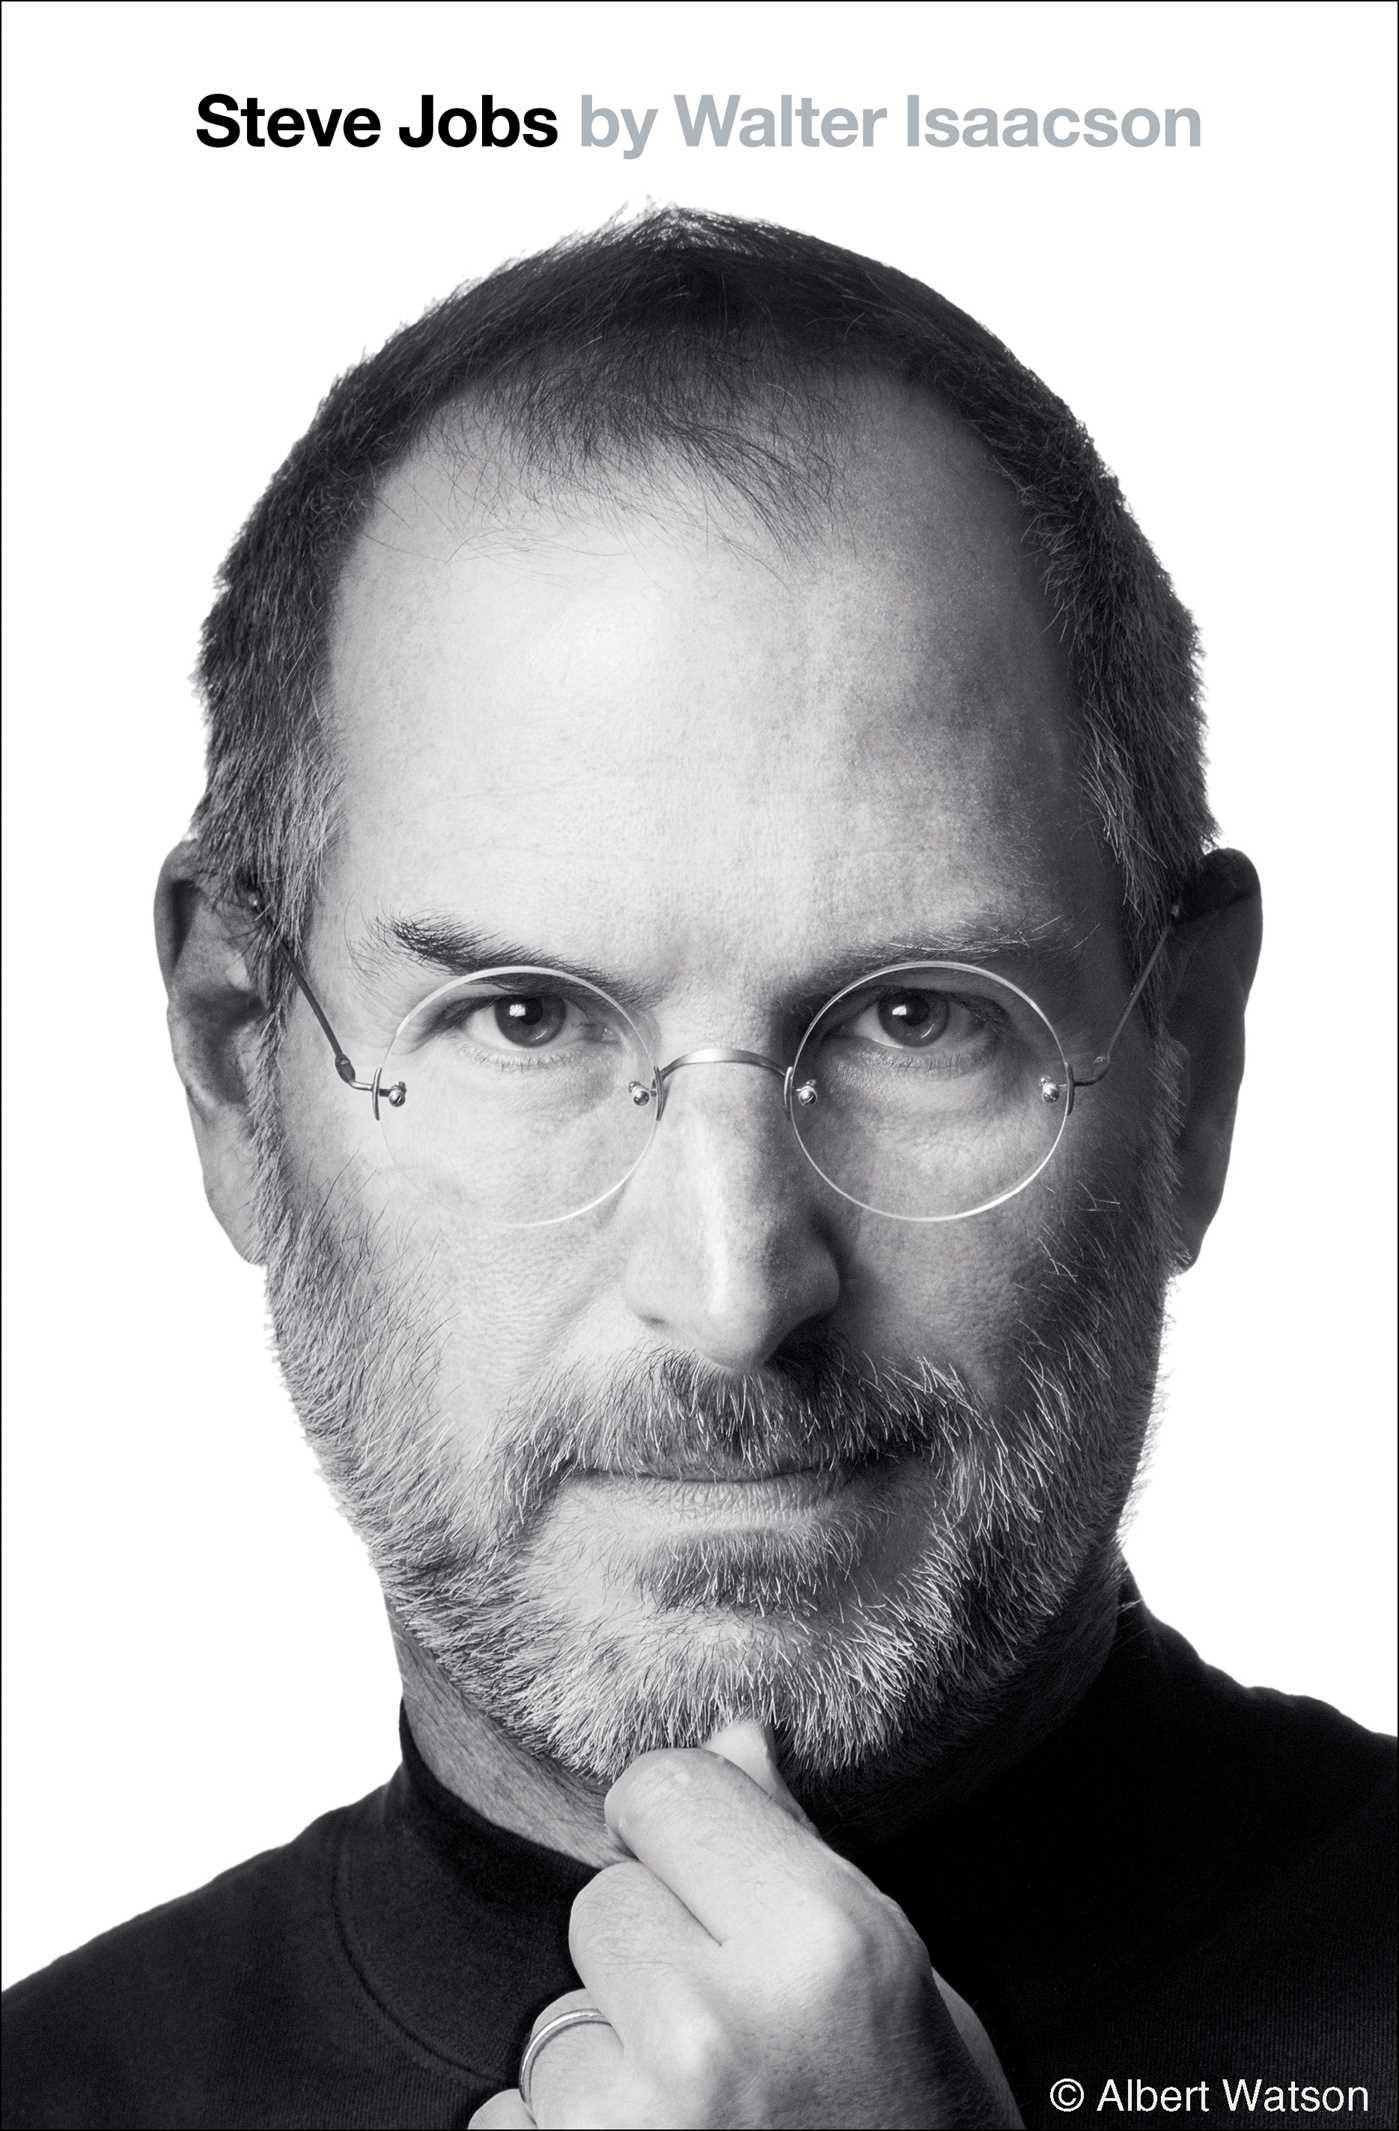 Book Cover of Steve Jobs